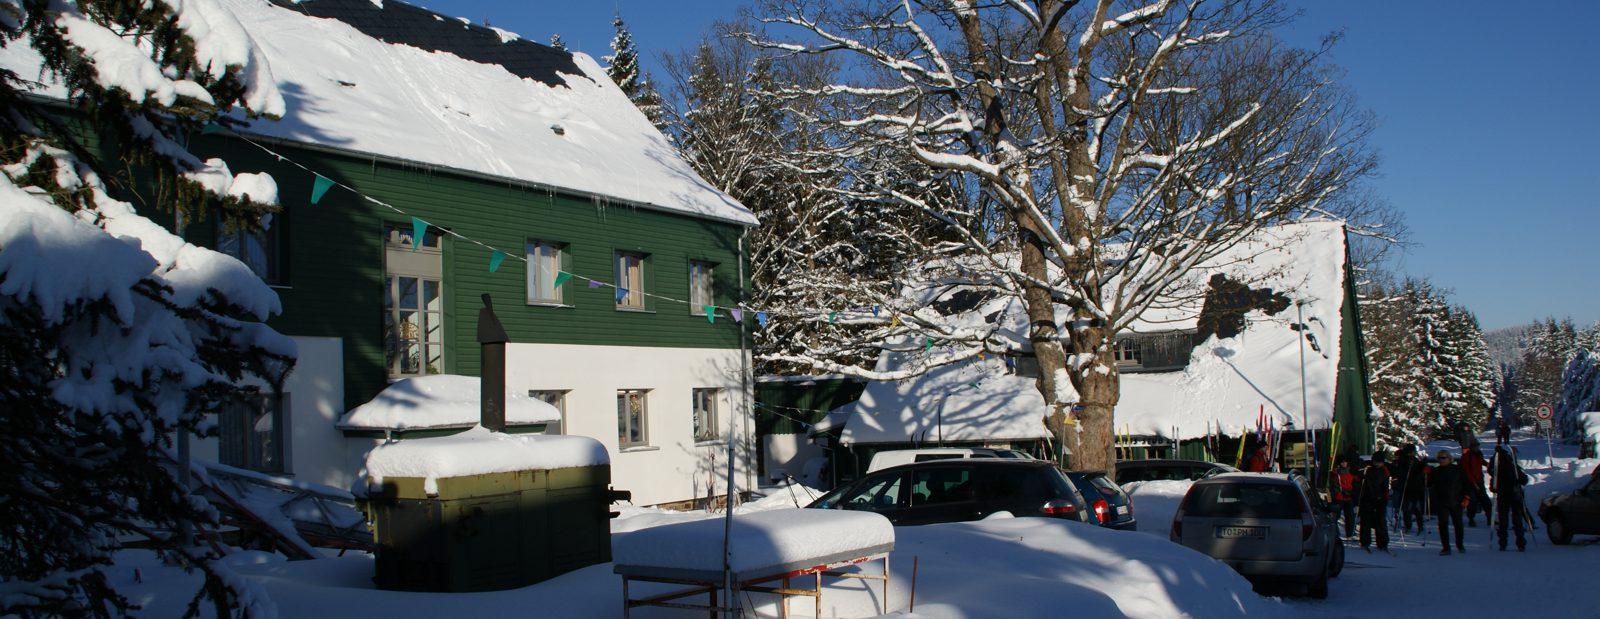 Torfhaus im Winter